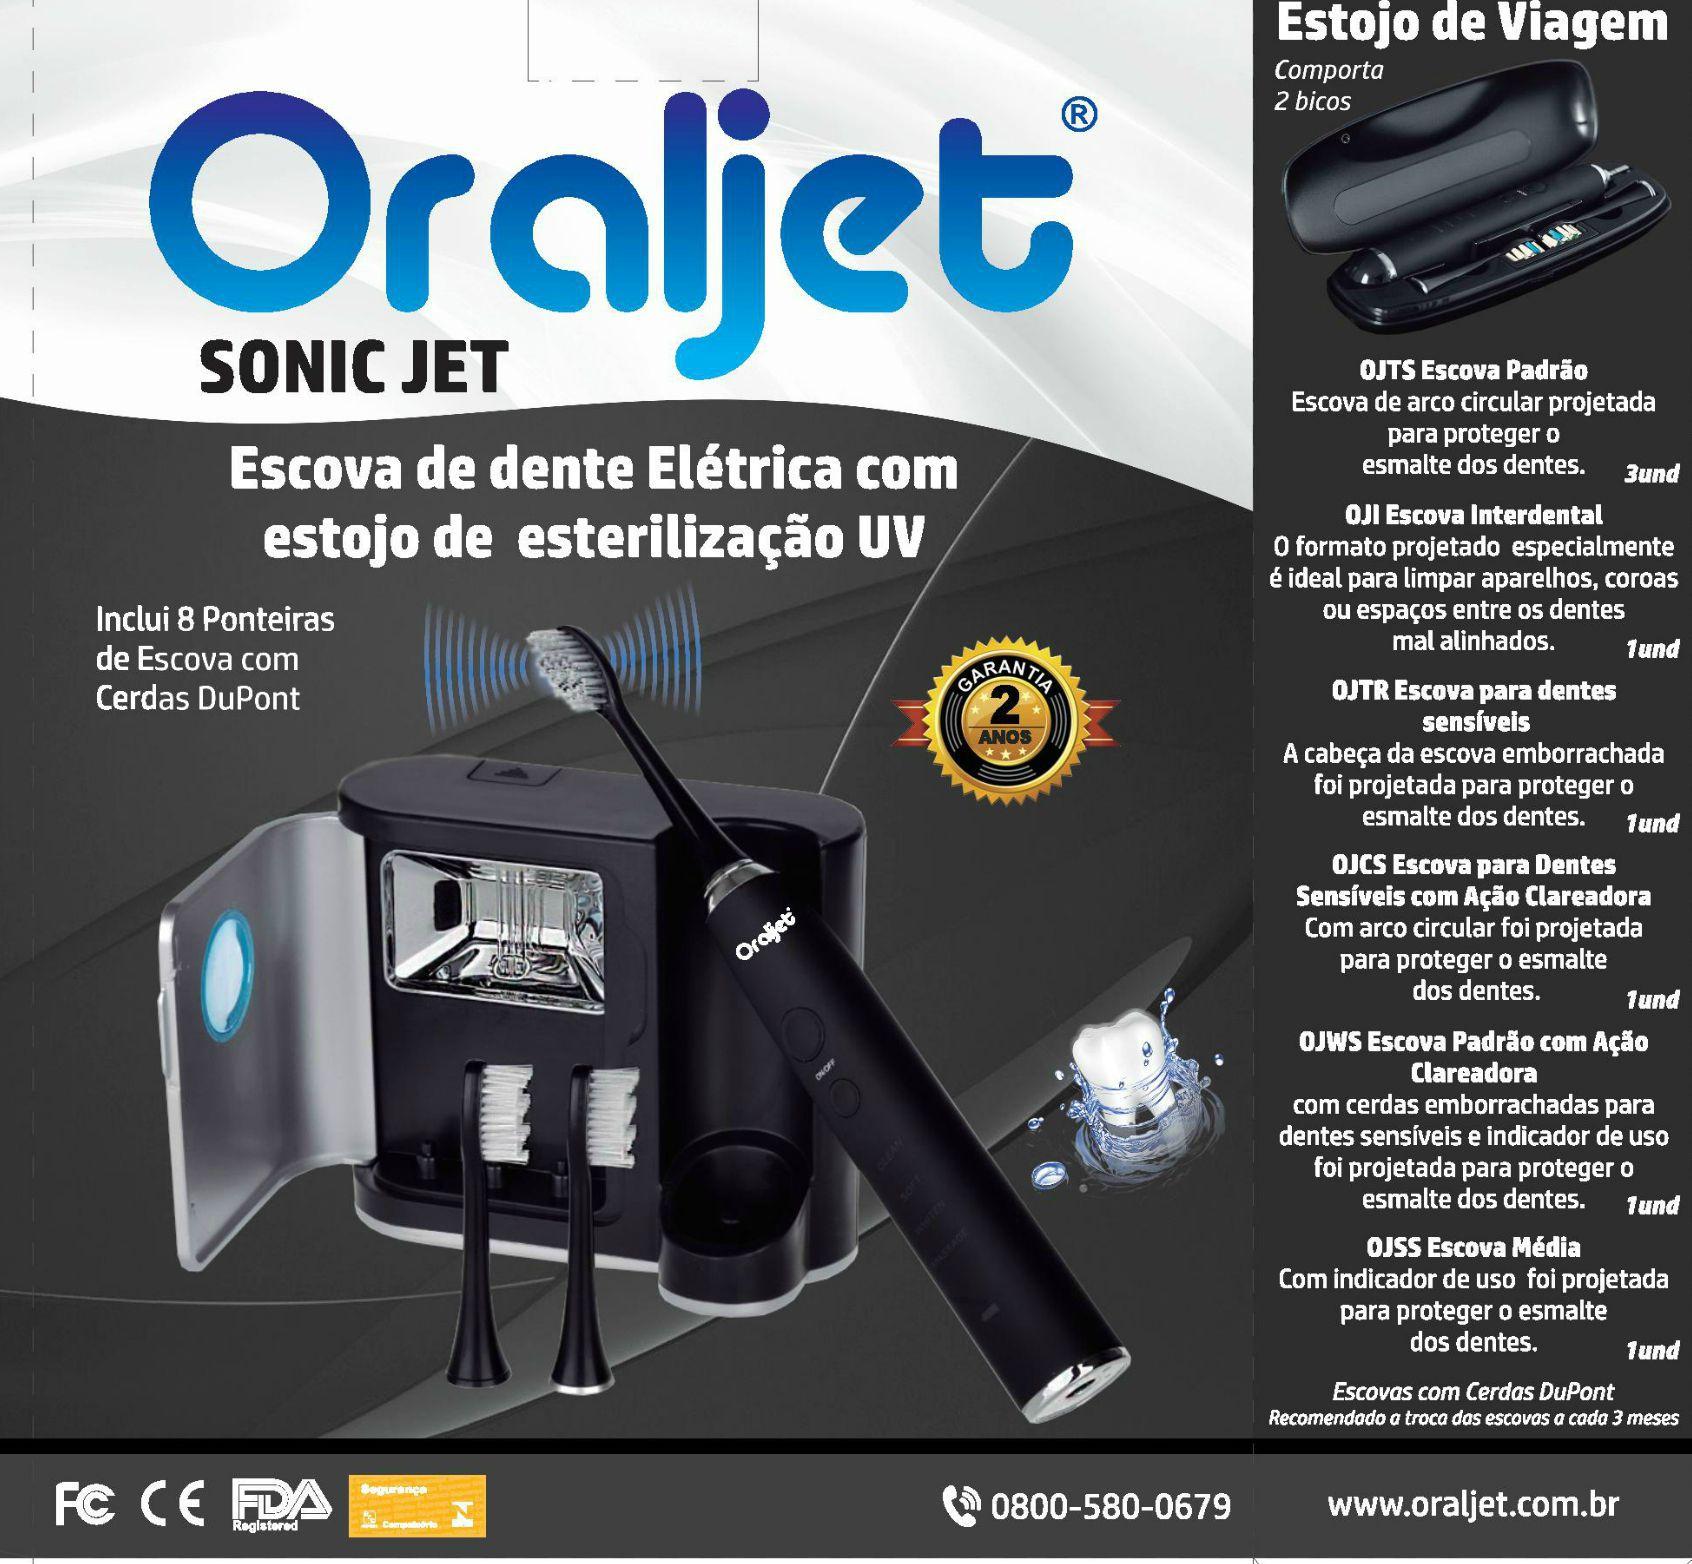 Oraljet Escova Dental Elétrica Ultrassônica SonicJet com 8 cabeças - Bivolt